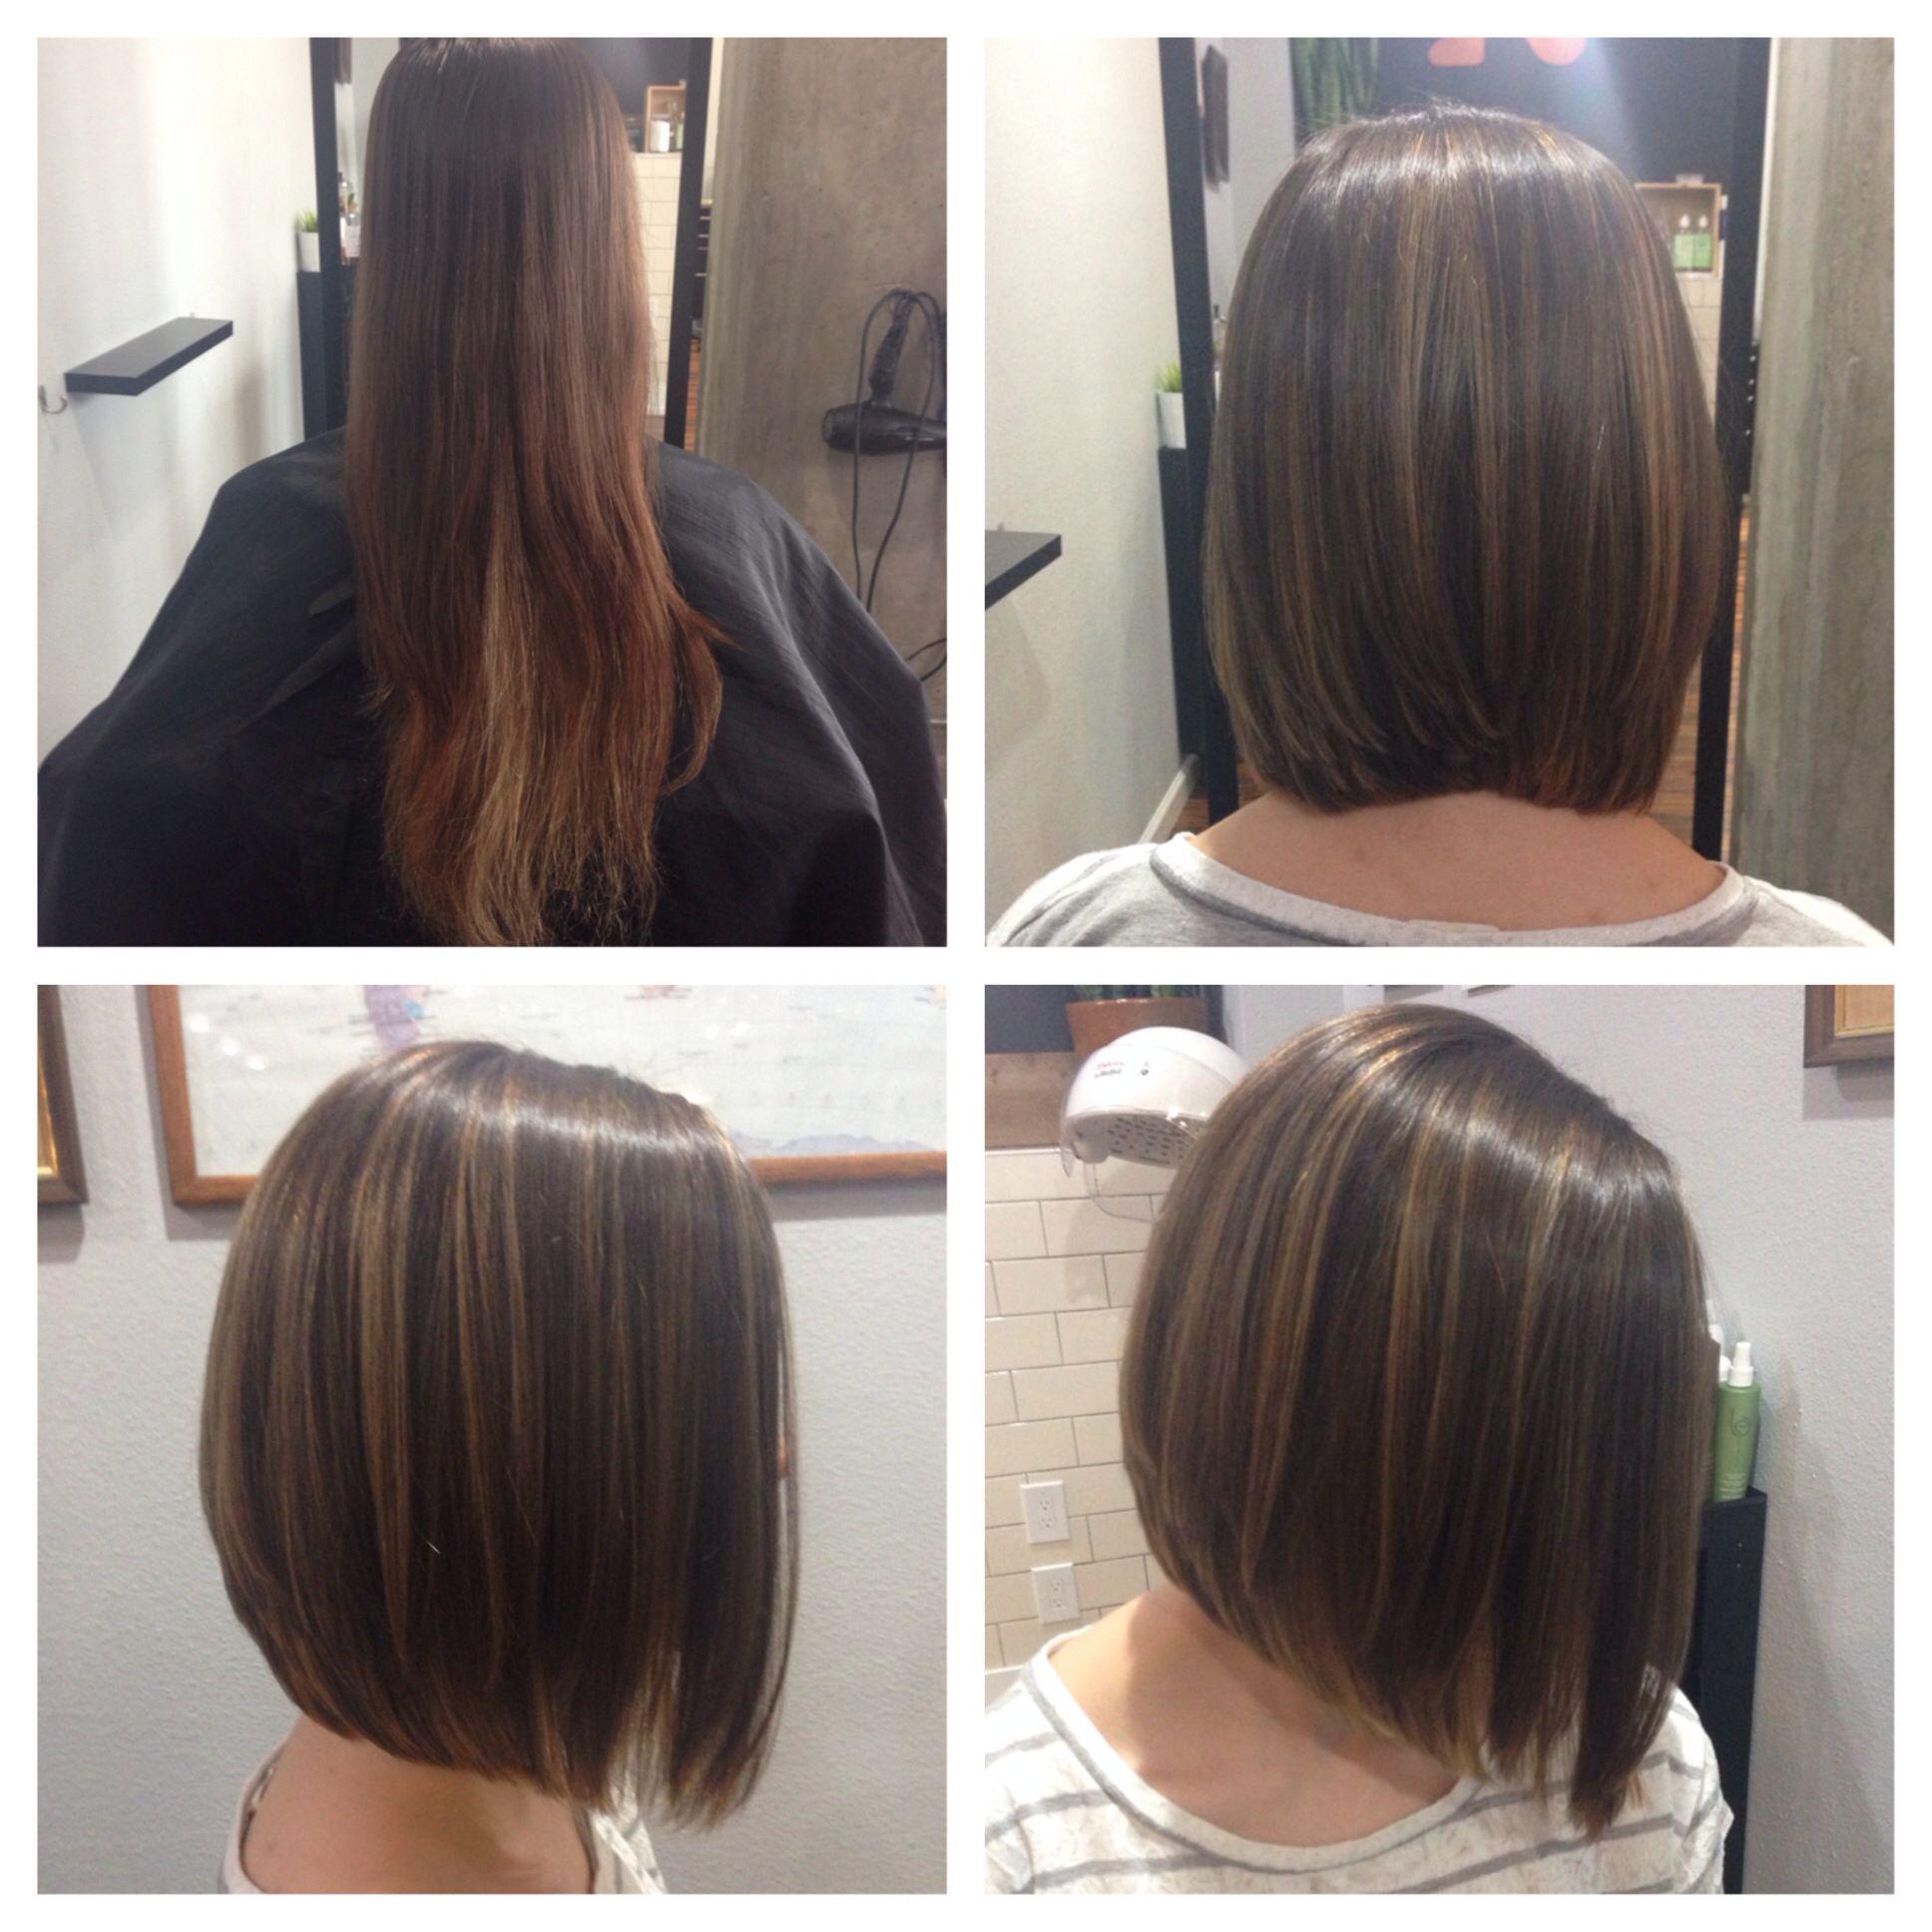 Pin By Jess Richie On Hairs Shoulder Length Bob Haircut Bobs For Thin Hair Hair Styles